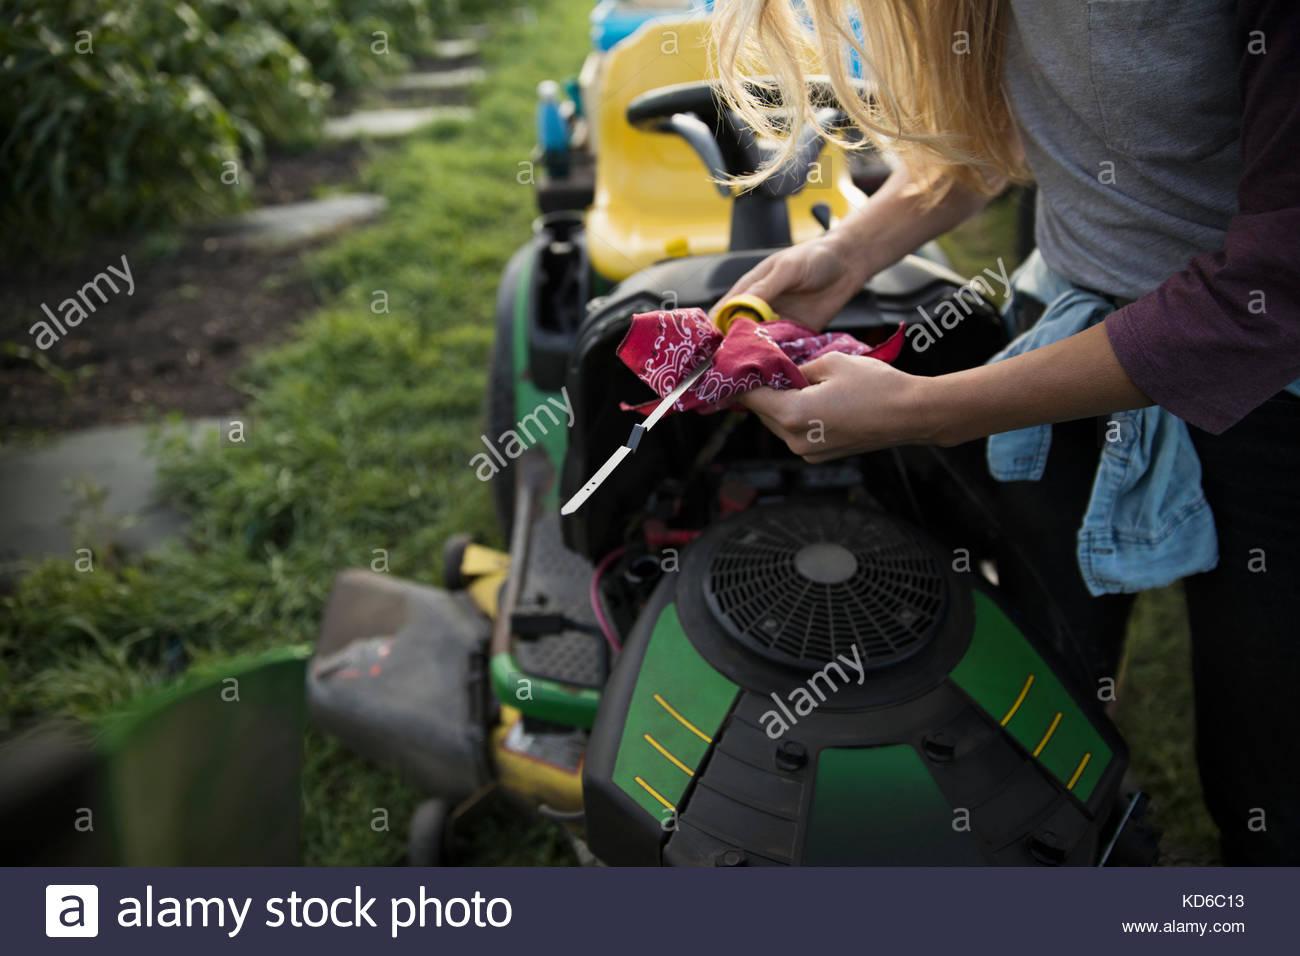 Female farmer checking oil dipstick at tractor - Stock Image